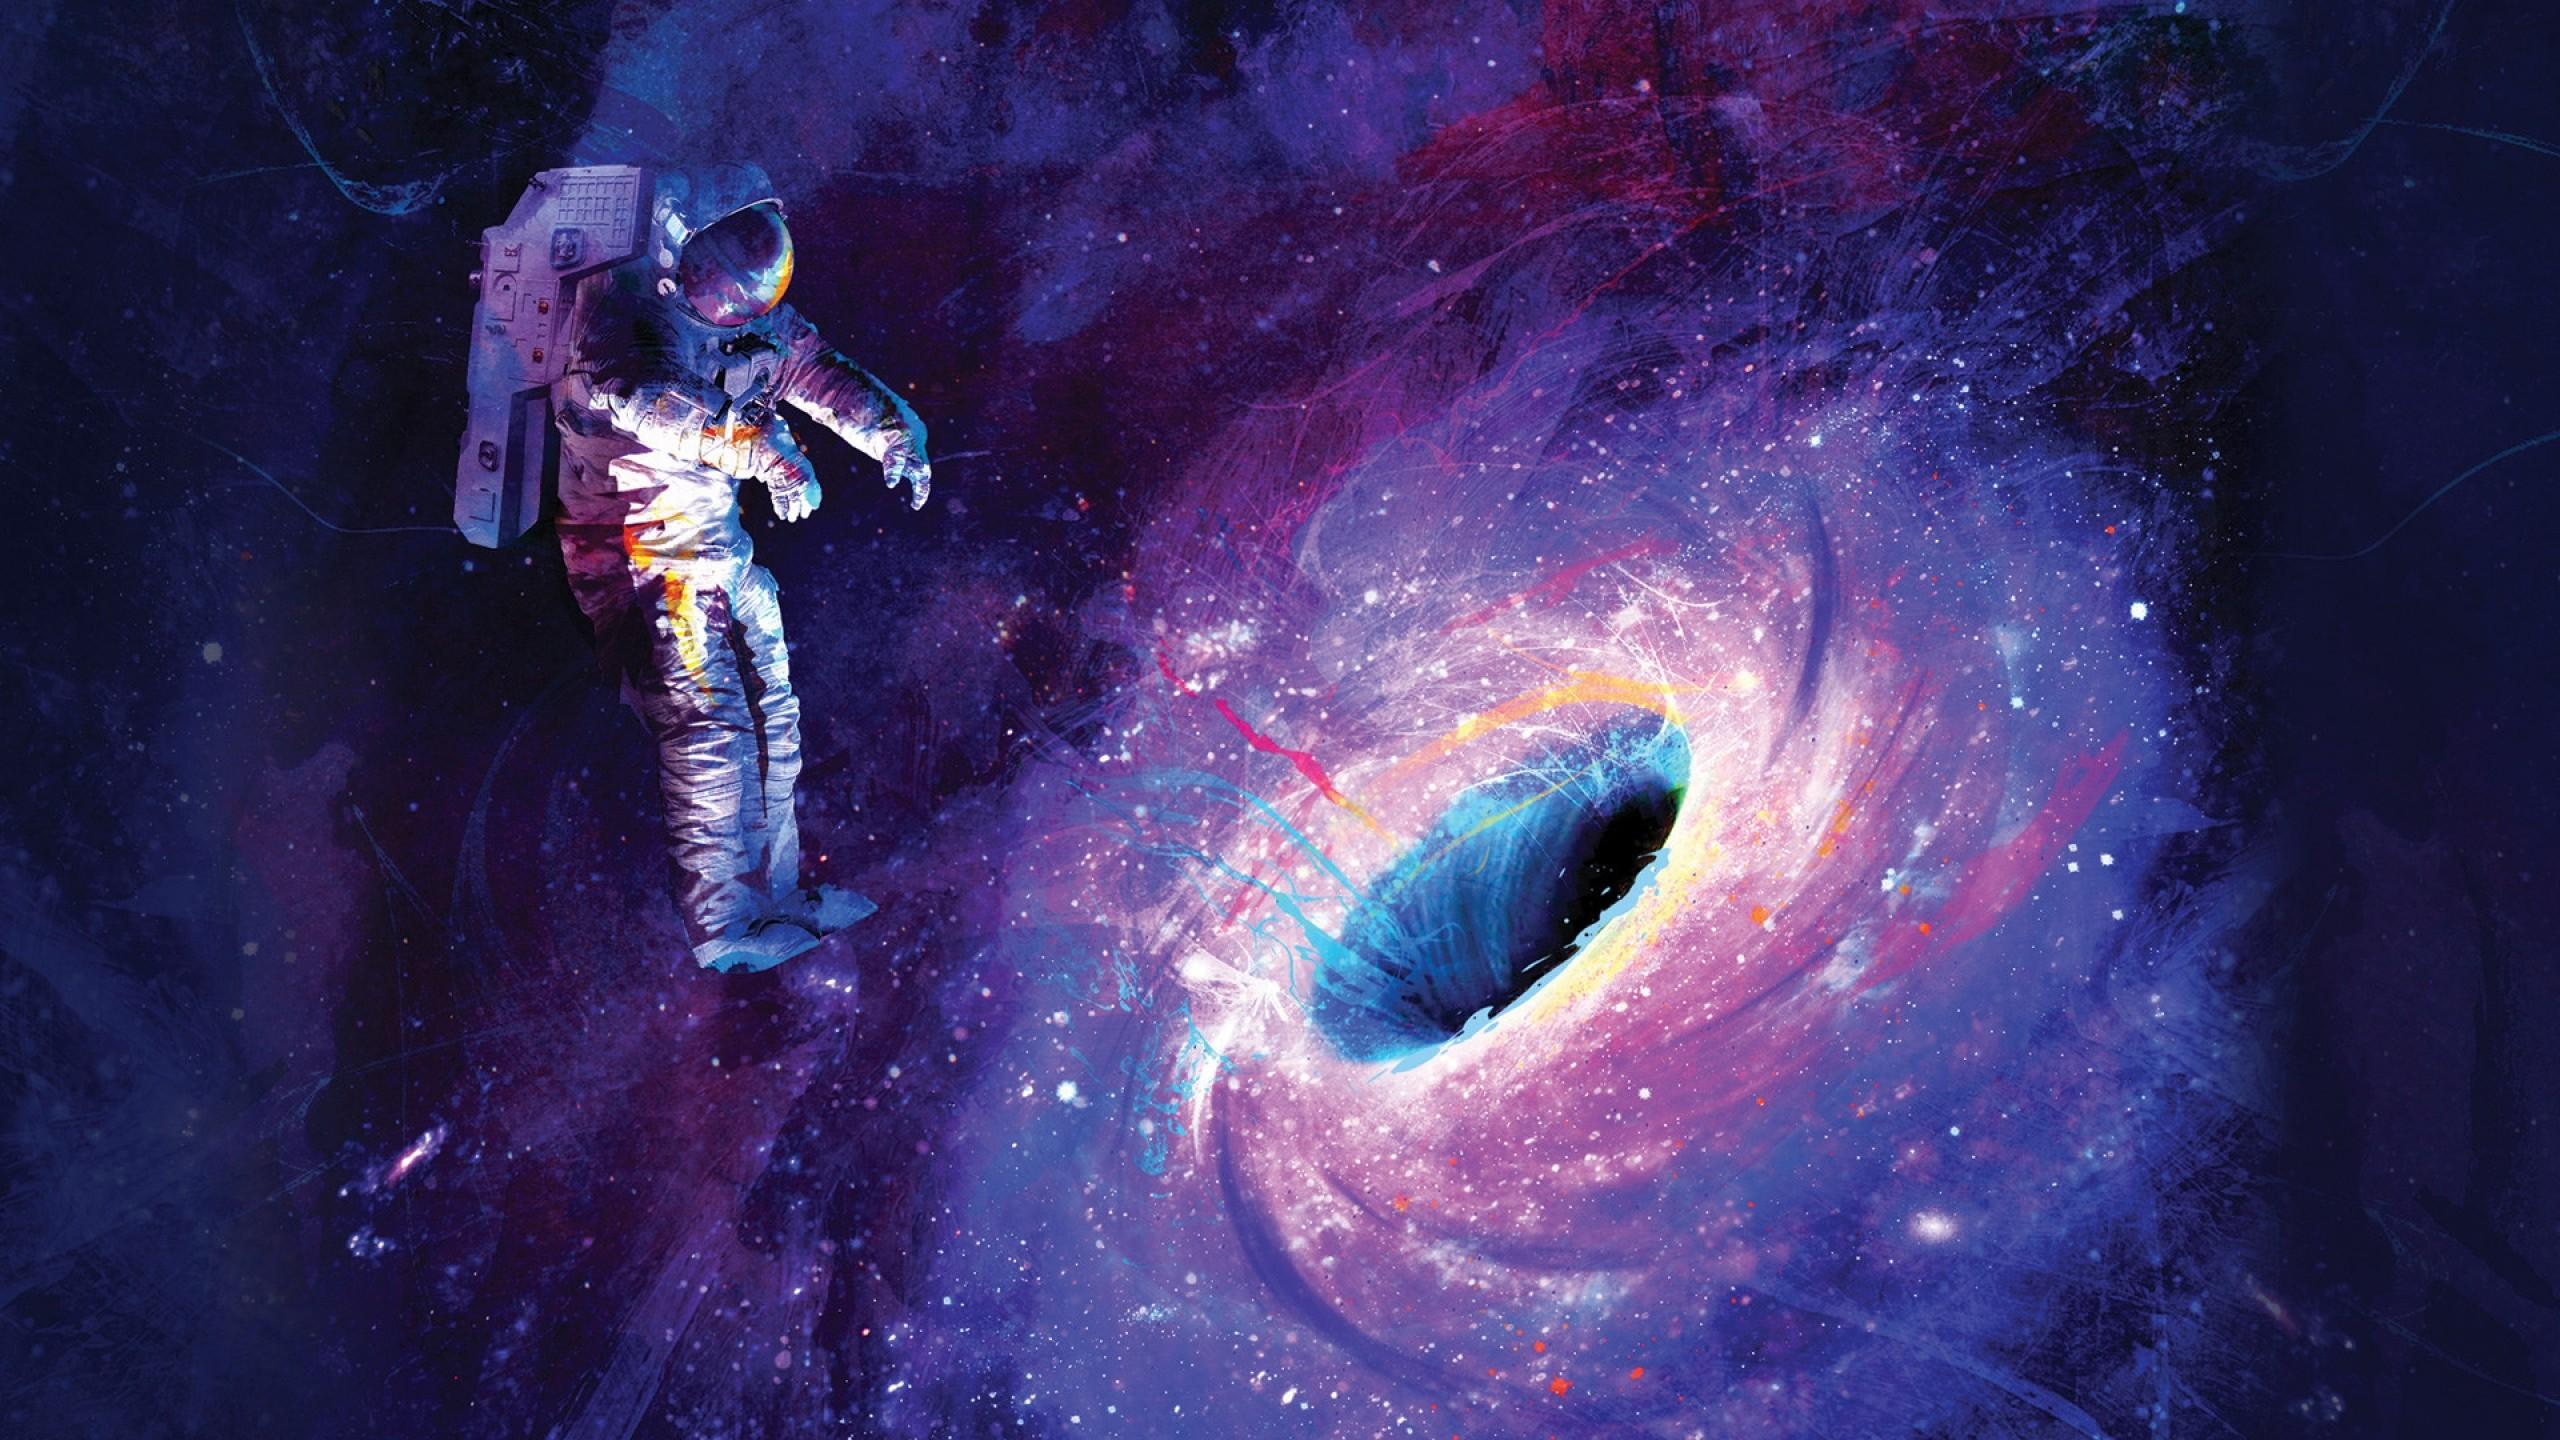 Wallpaper Colorful Galaxy Artwork Blue Nebula